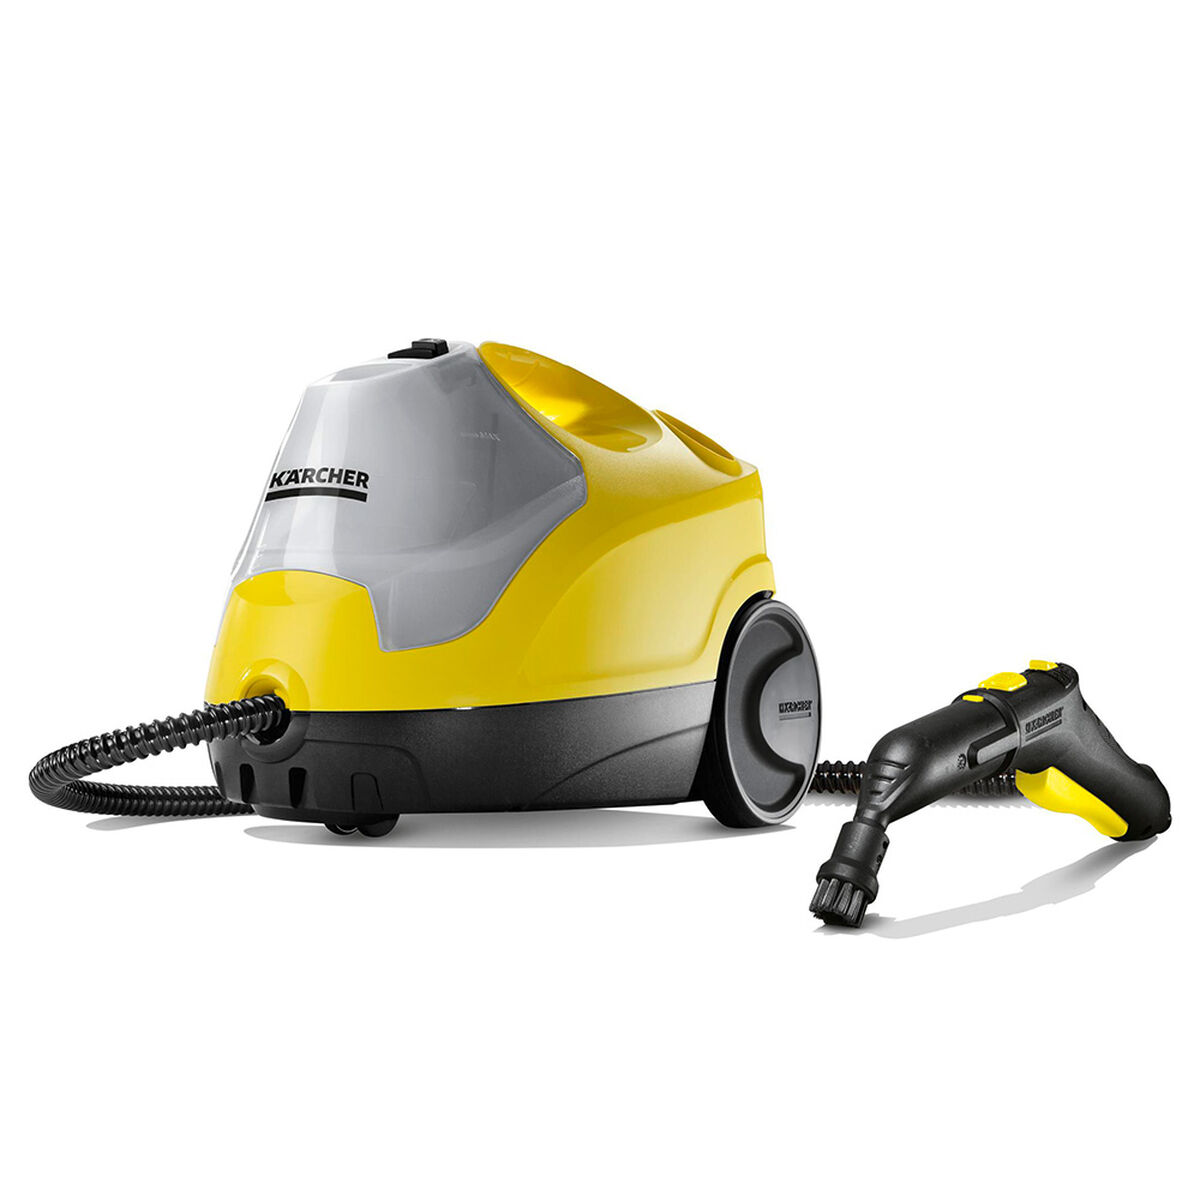 Limpiadora de Vapor Karcher SC 4 EasyFix 2000 W